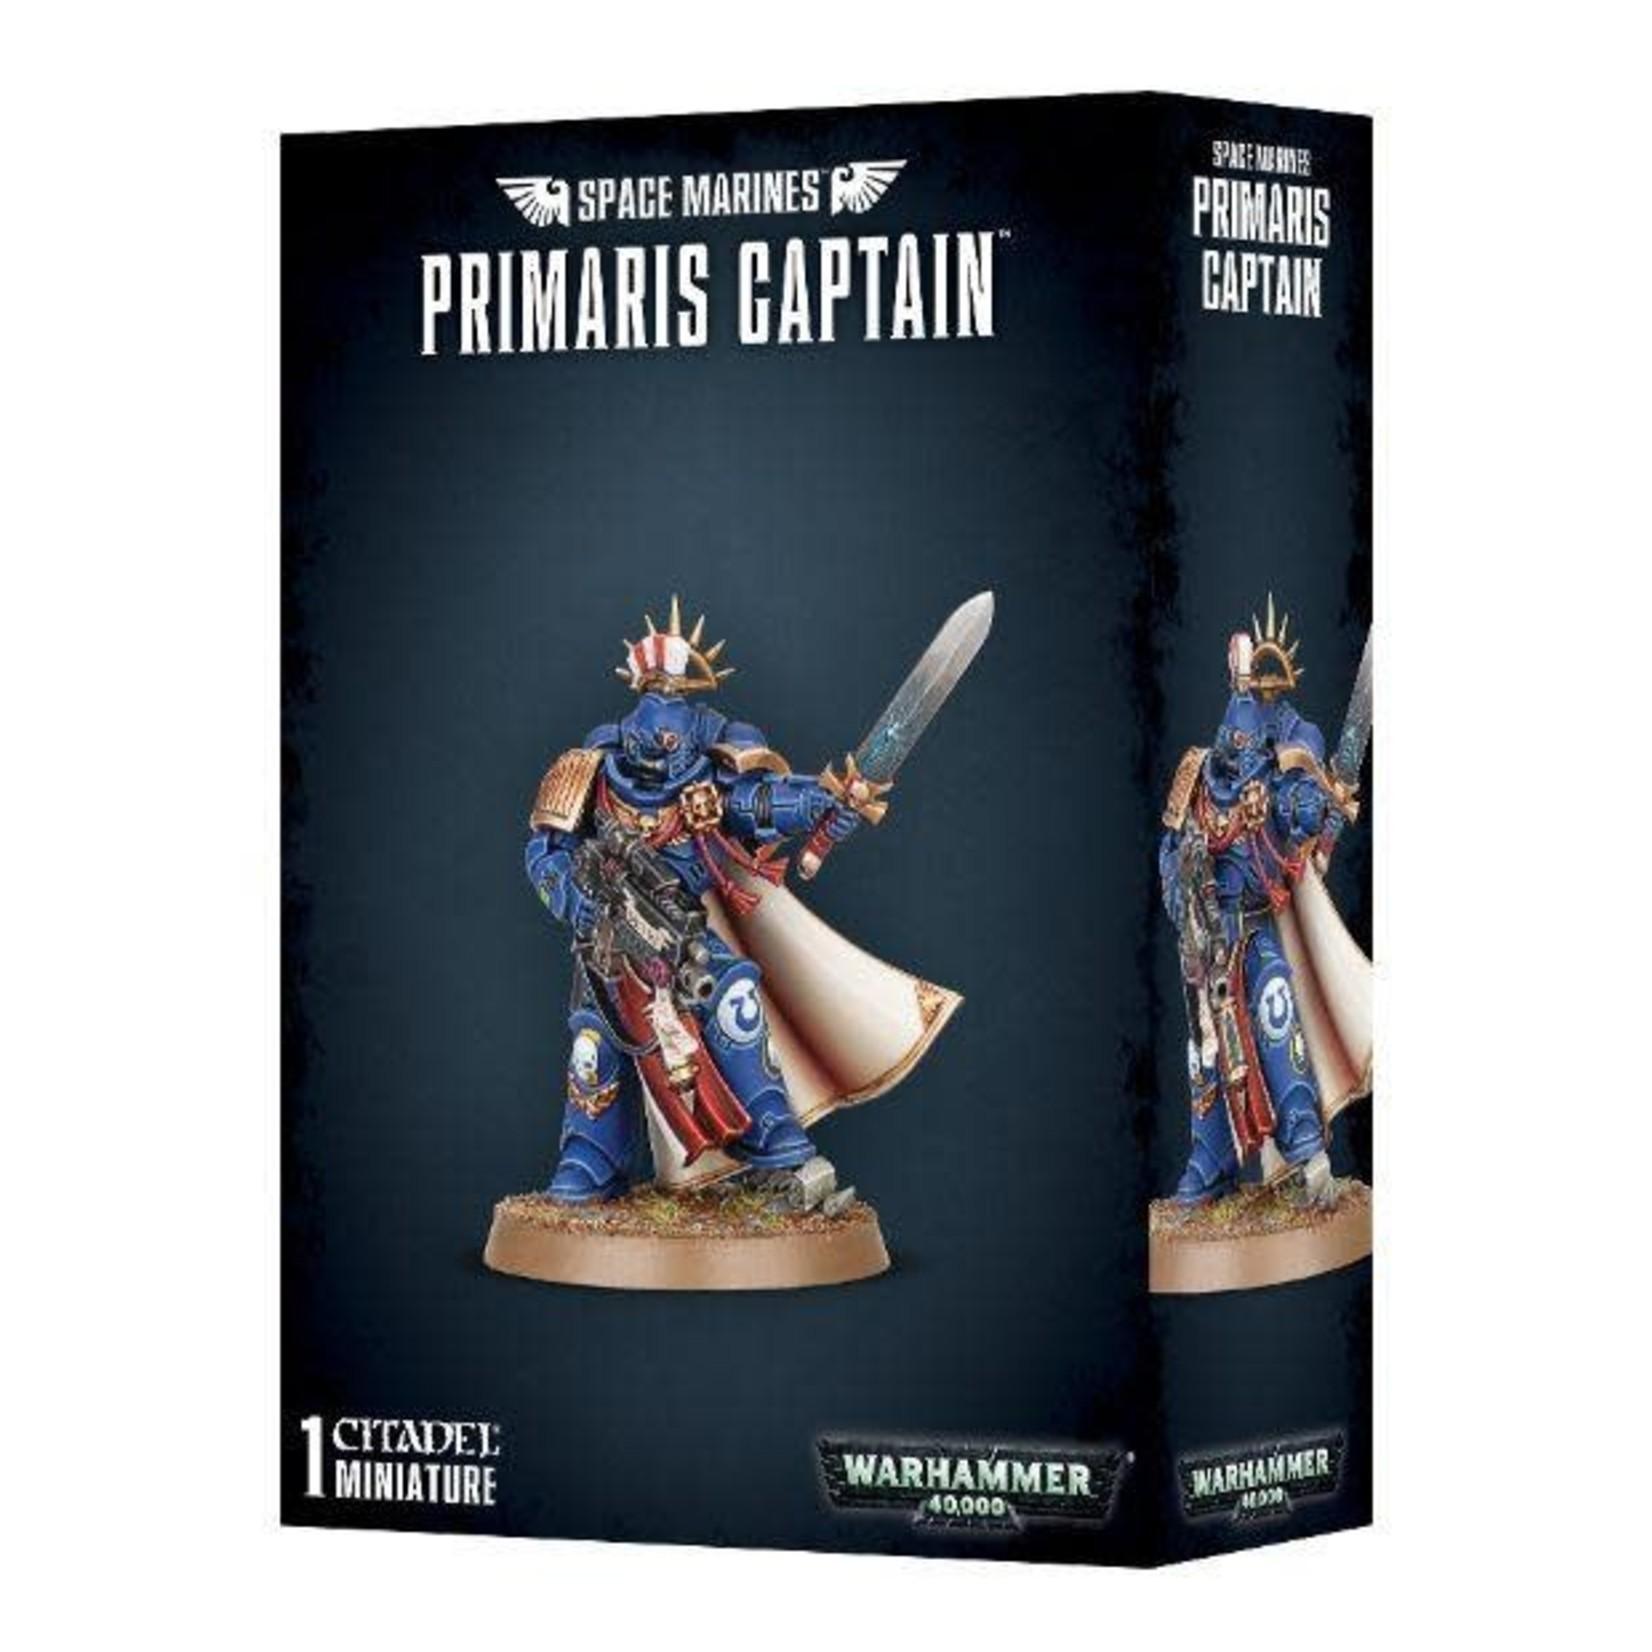 Games Workshop Warhammer 40K: Space Marines - Primaris Captain